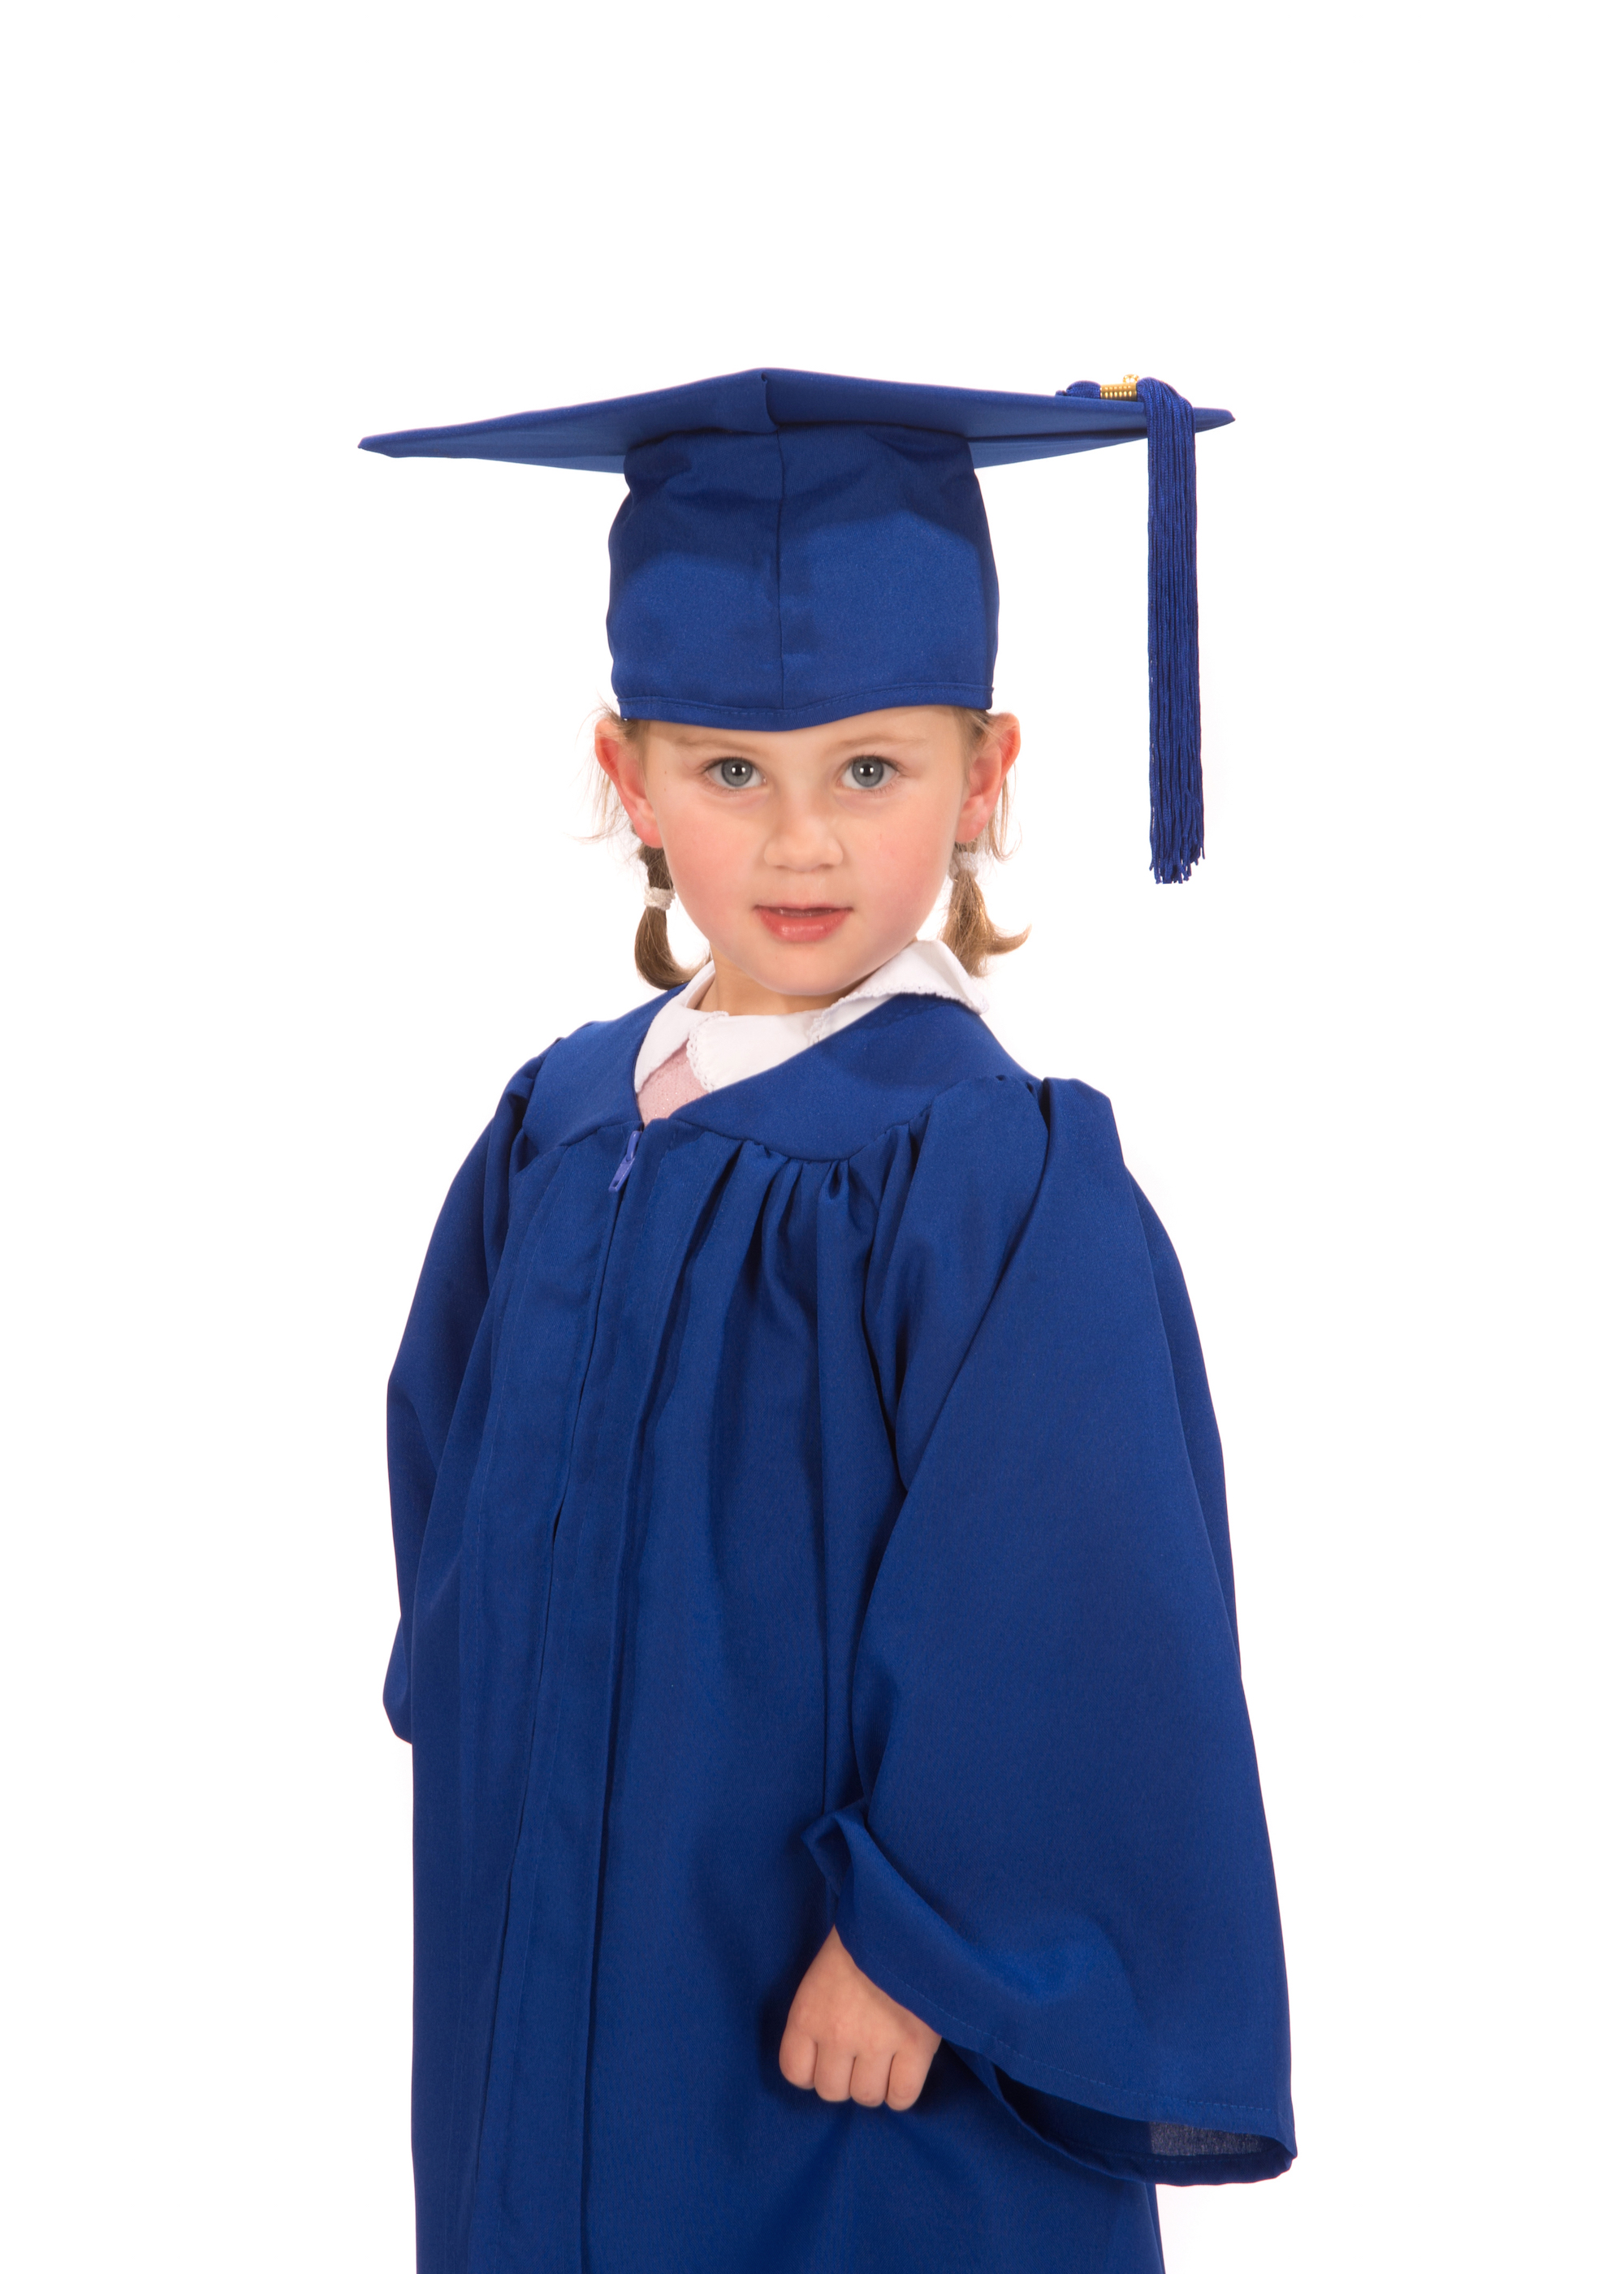 Childrens\' Graduation Gown